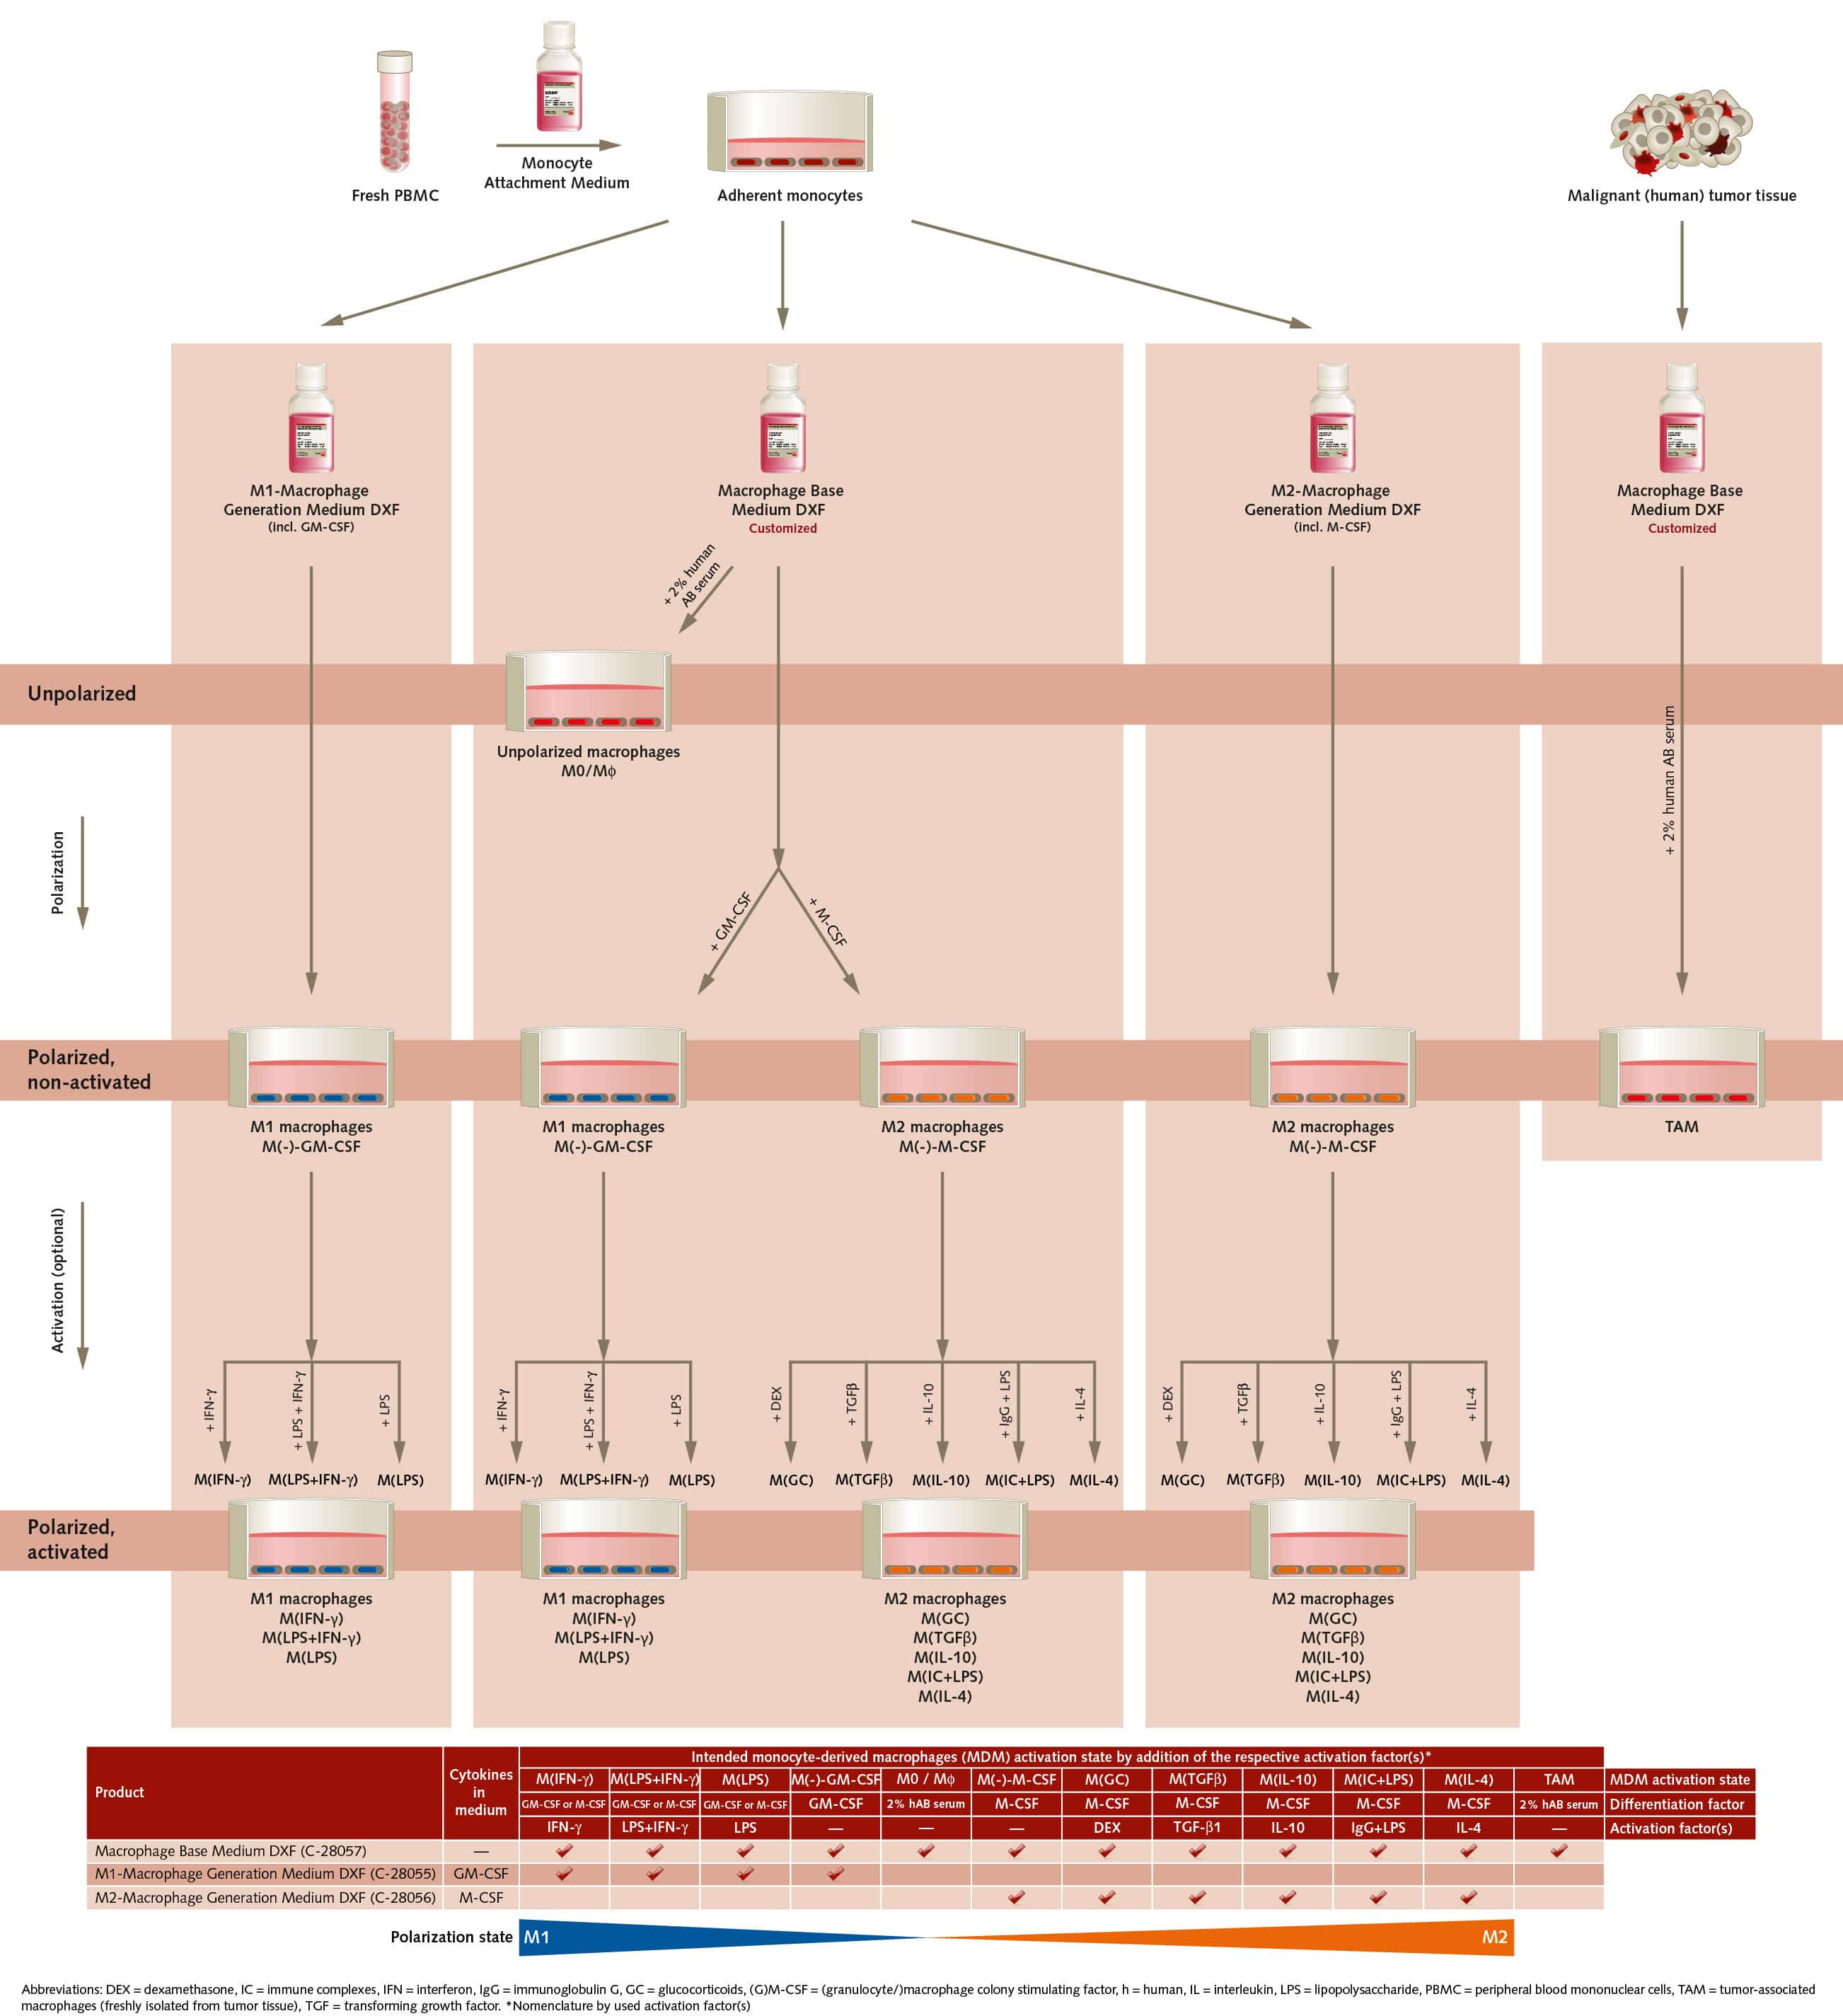 Macrophage Generation